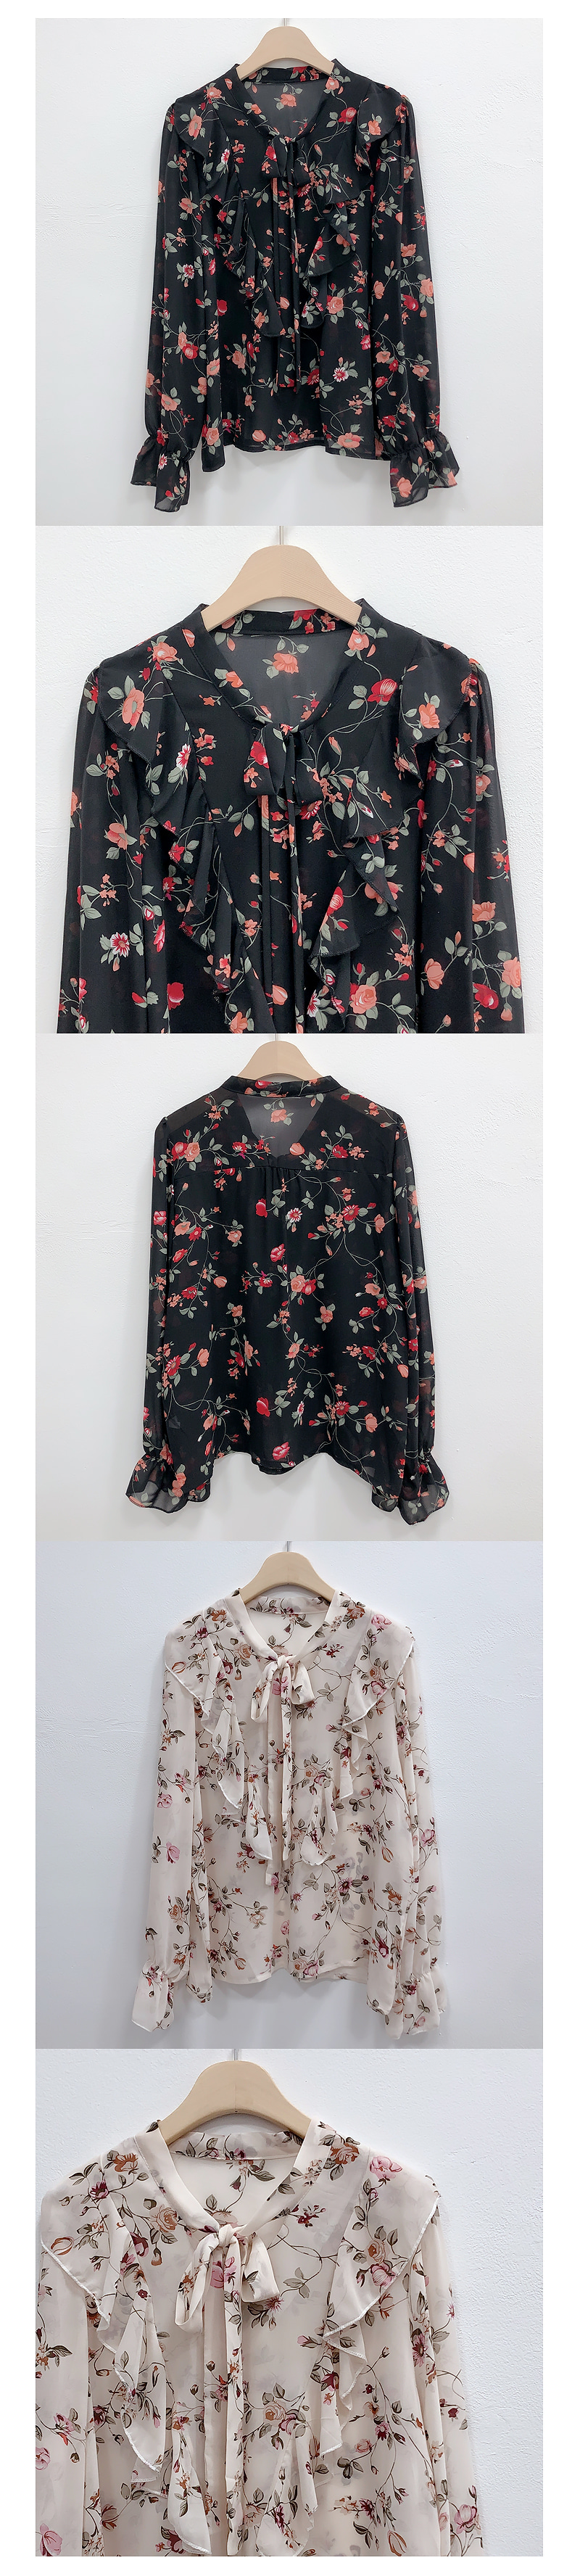 Order rush ♥ ubulmi cherry ruffle blouse